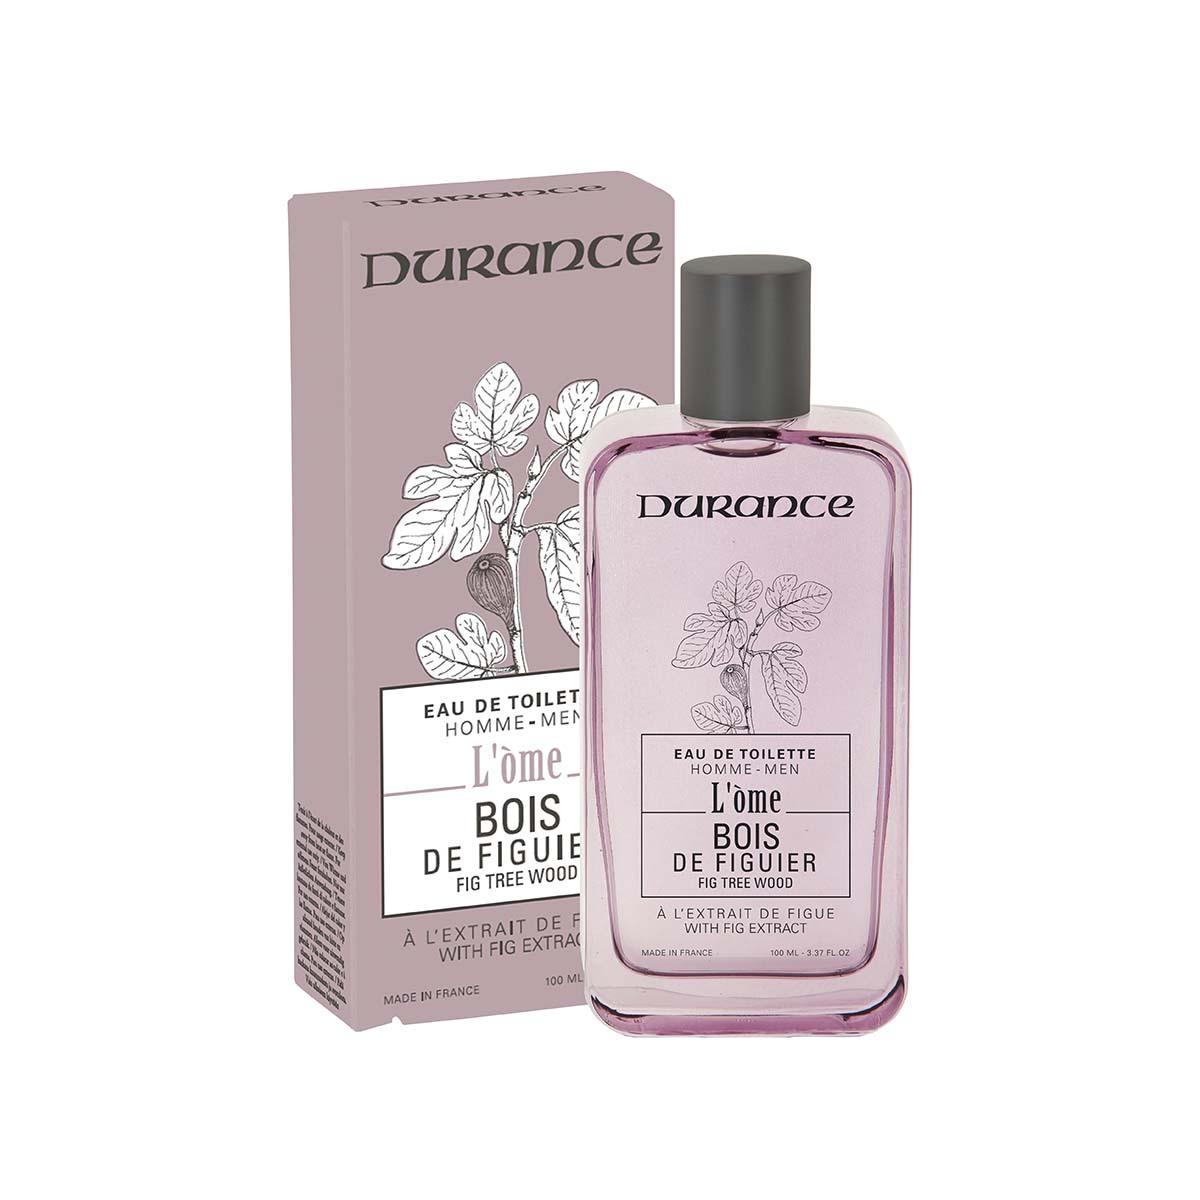 Durance Eau de Toilette Feigenbaumholz mit Feigen-Extrakt